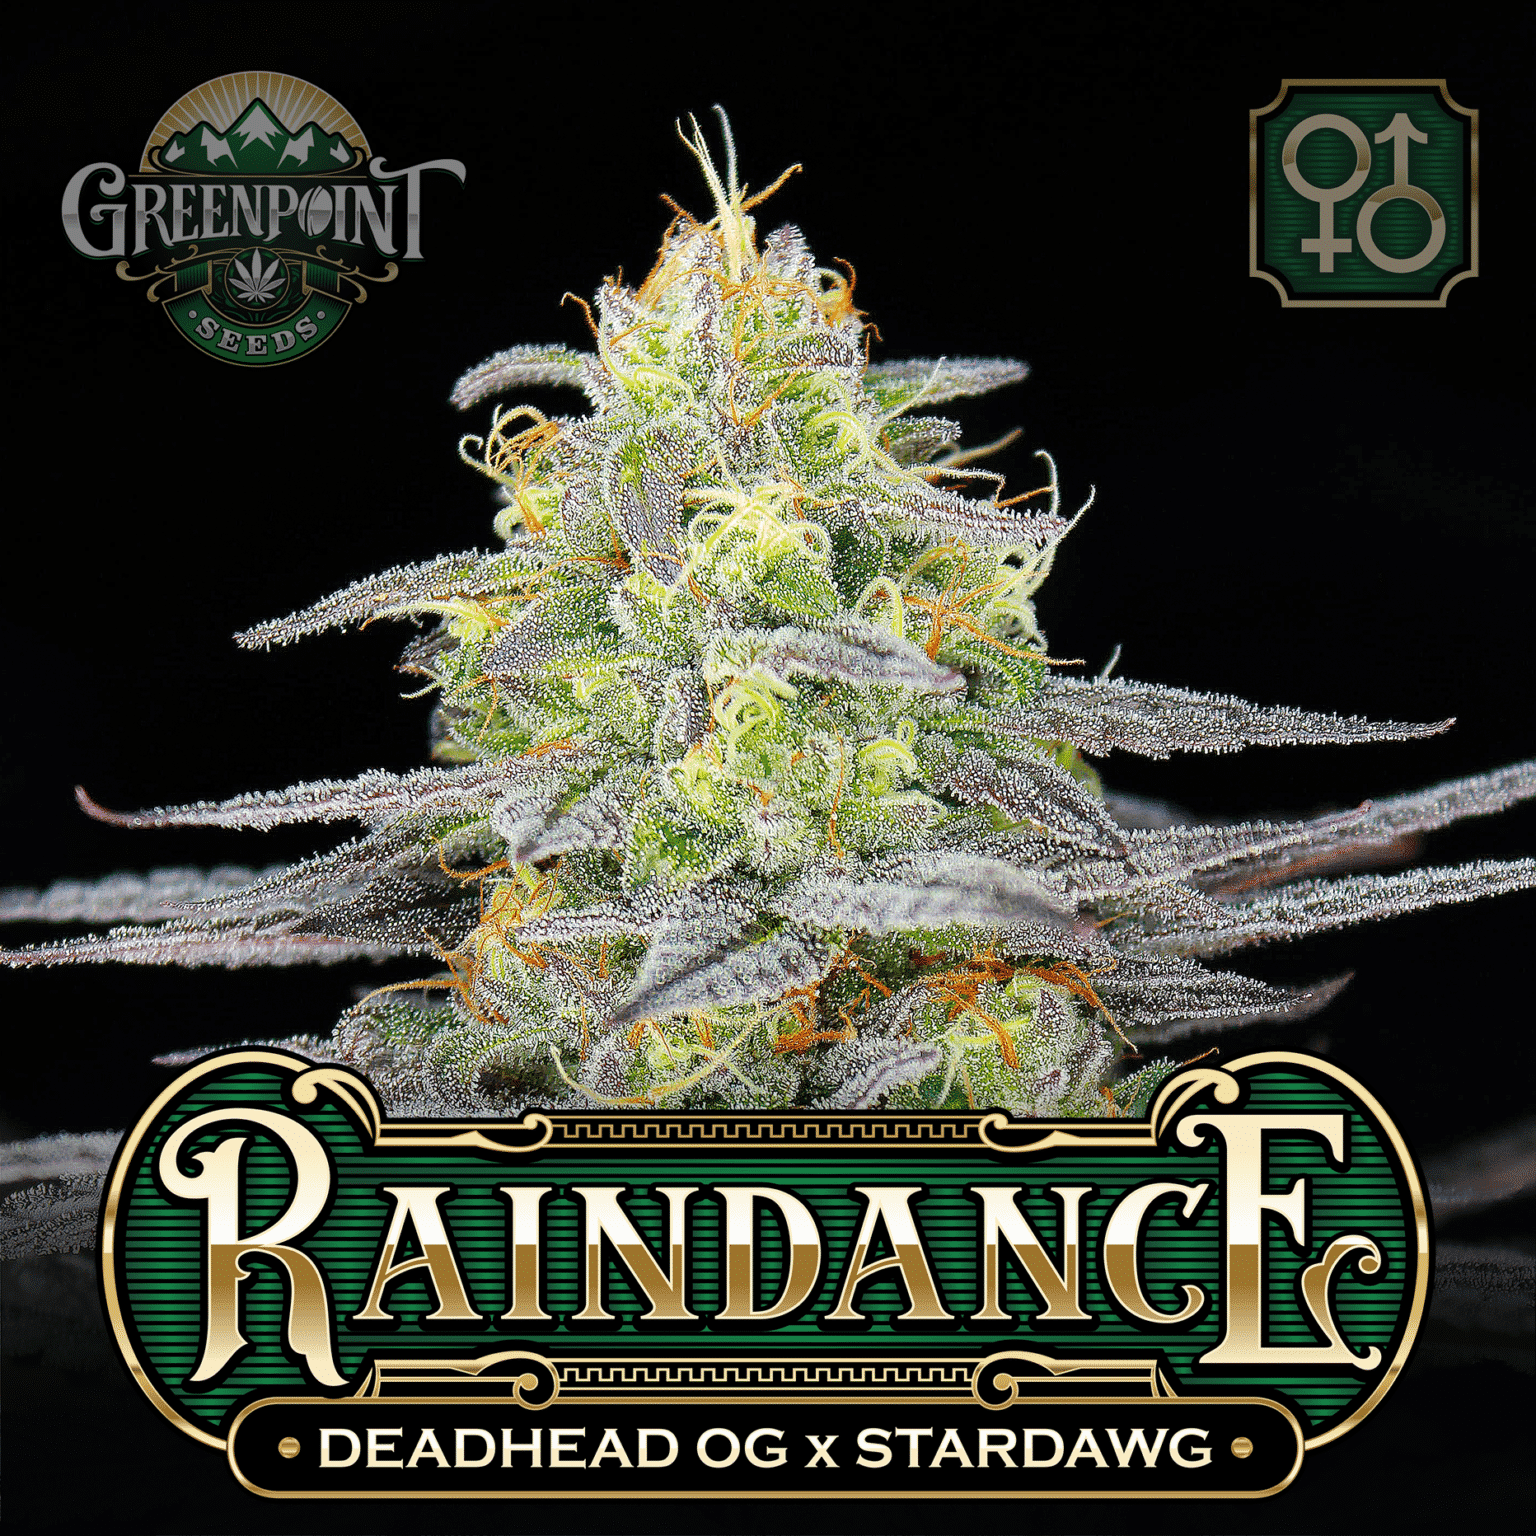 Deadhead OG x Stardawg Cannabis Seeds - Raindance Seeds - Greenpoint Seeds USA